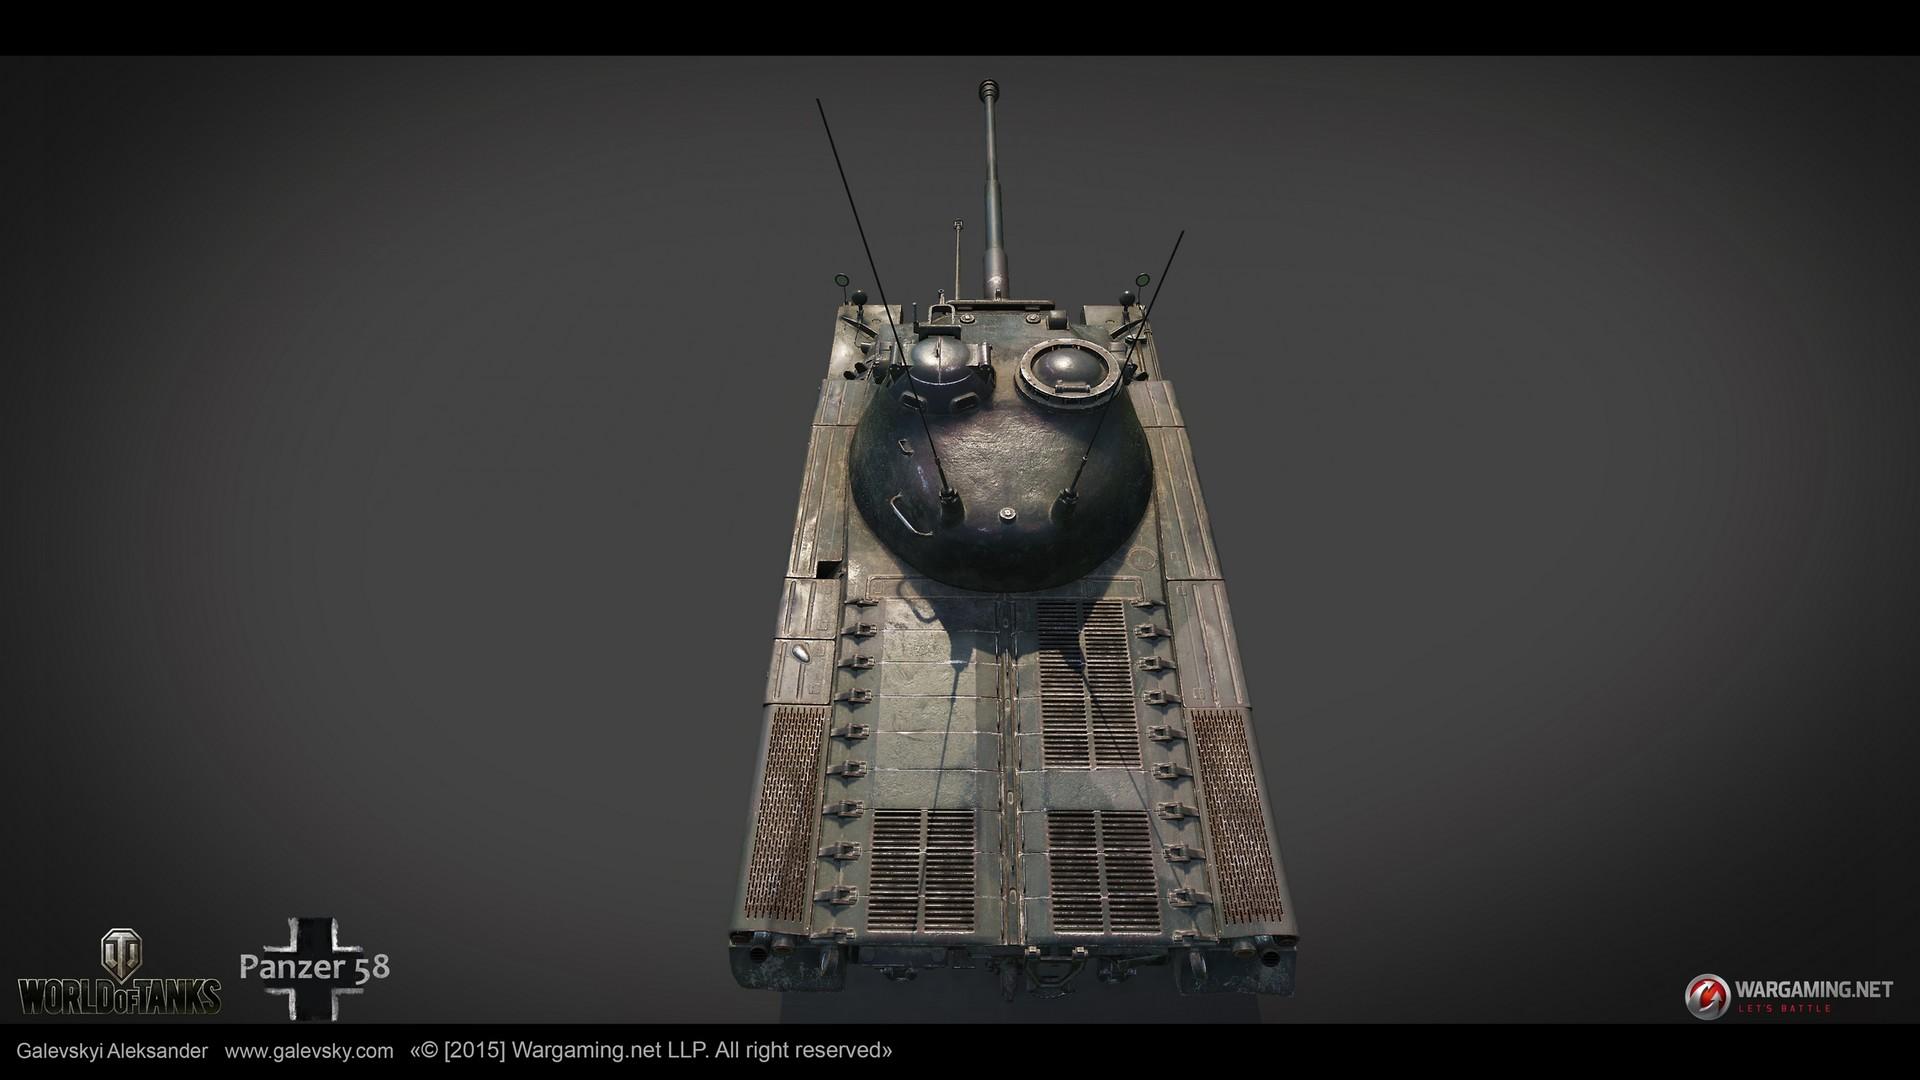 Aleksander galevskyi panzer 58 10 med